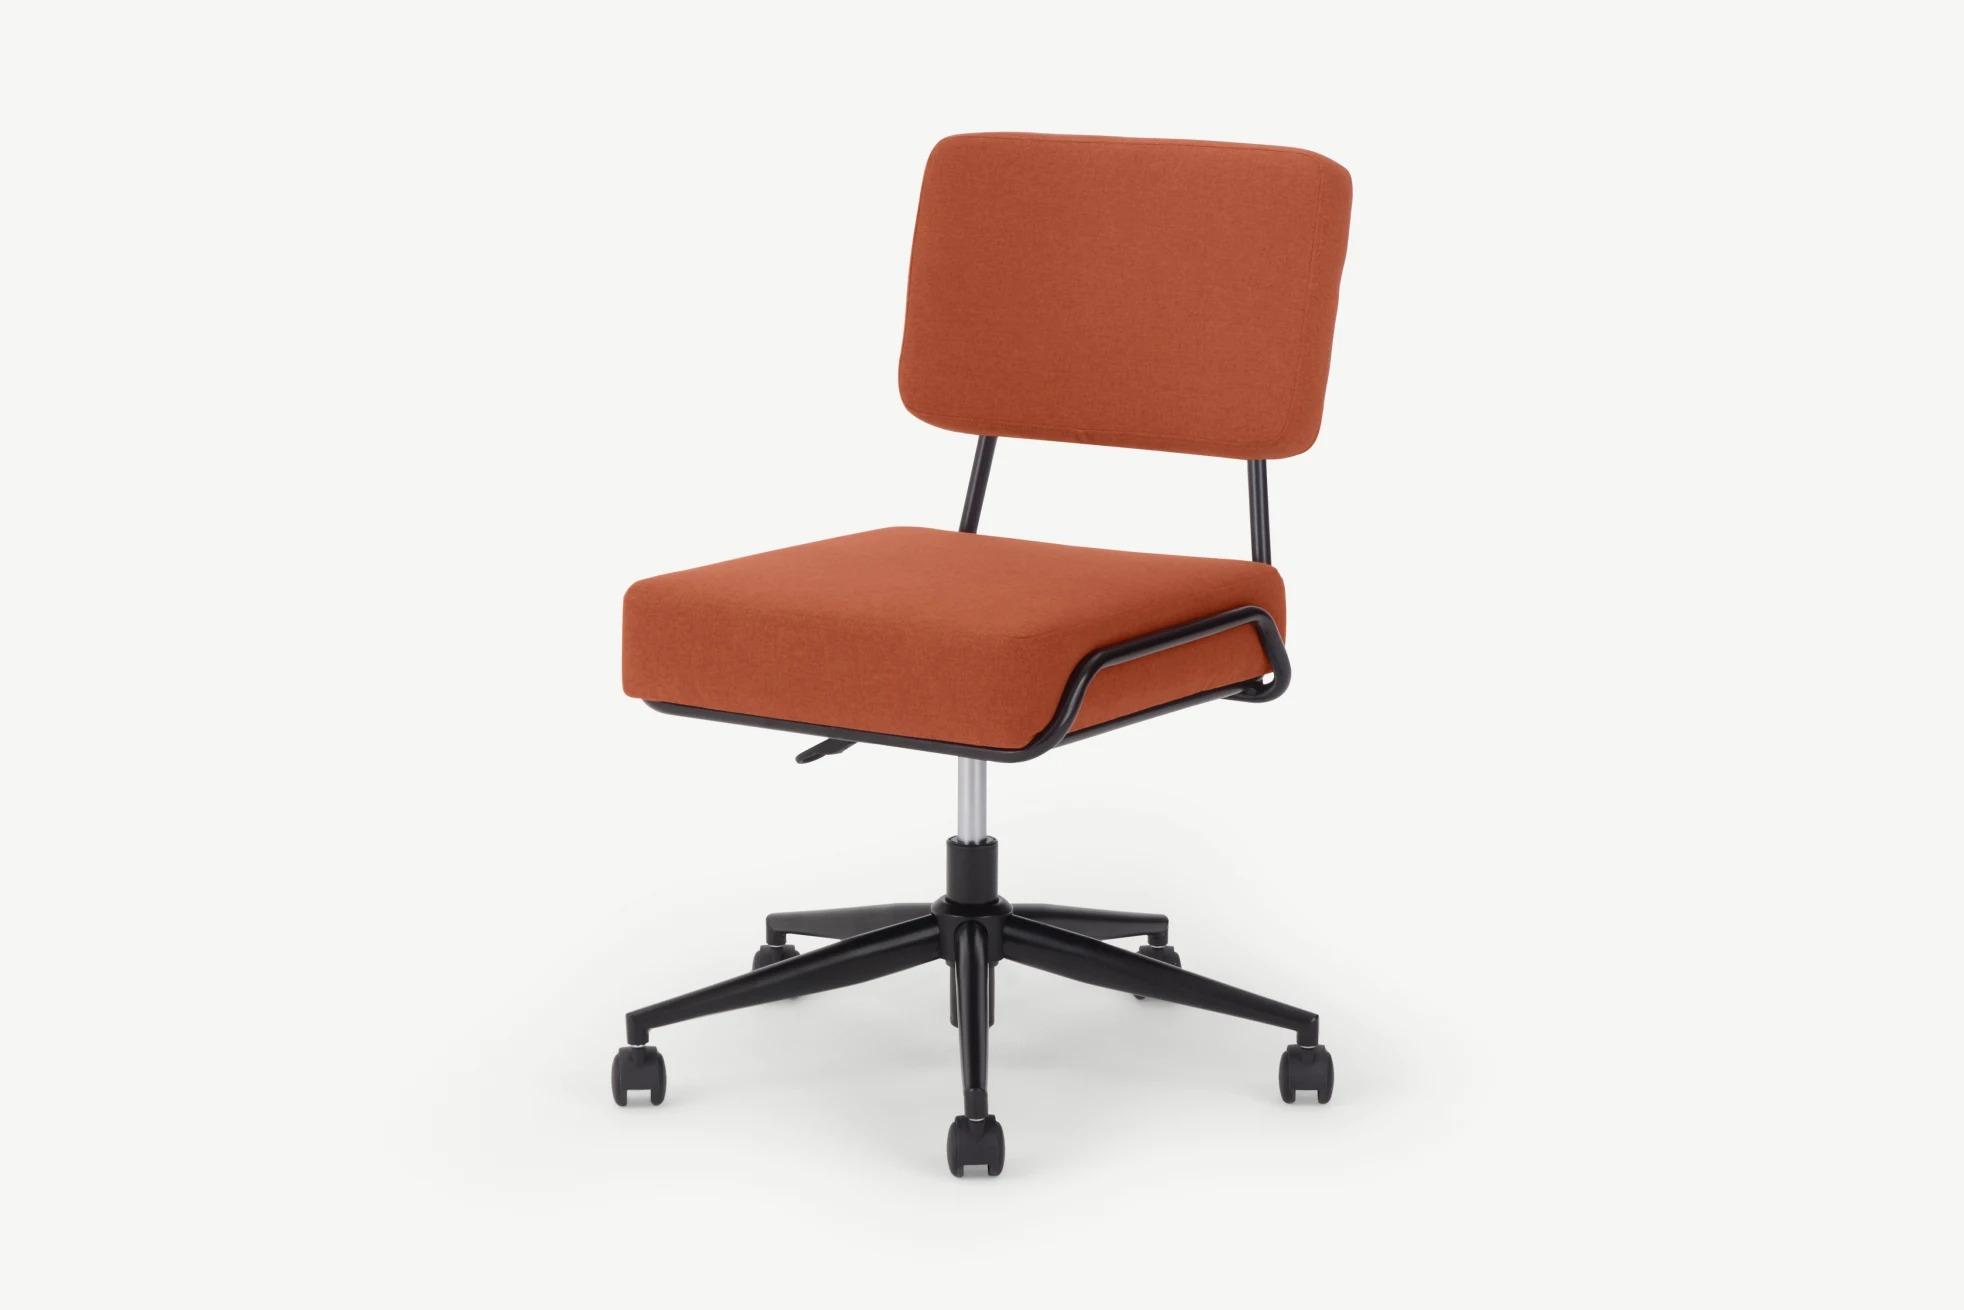 Silla de oficina Knox, naranja retro